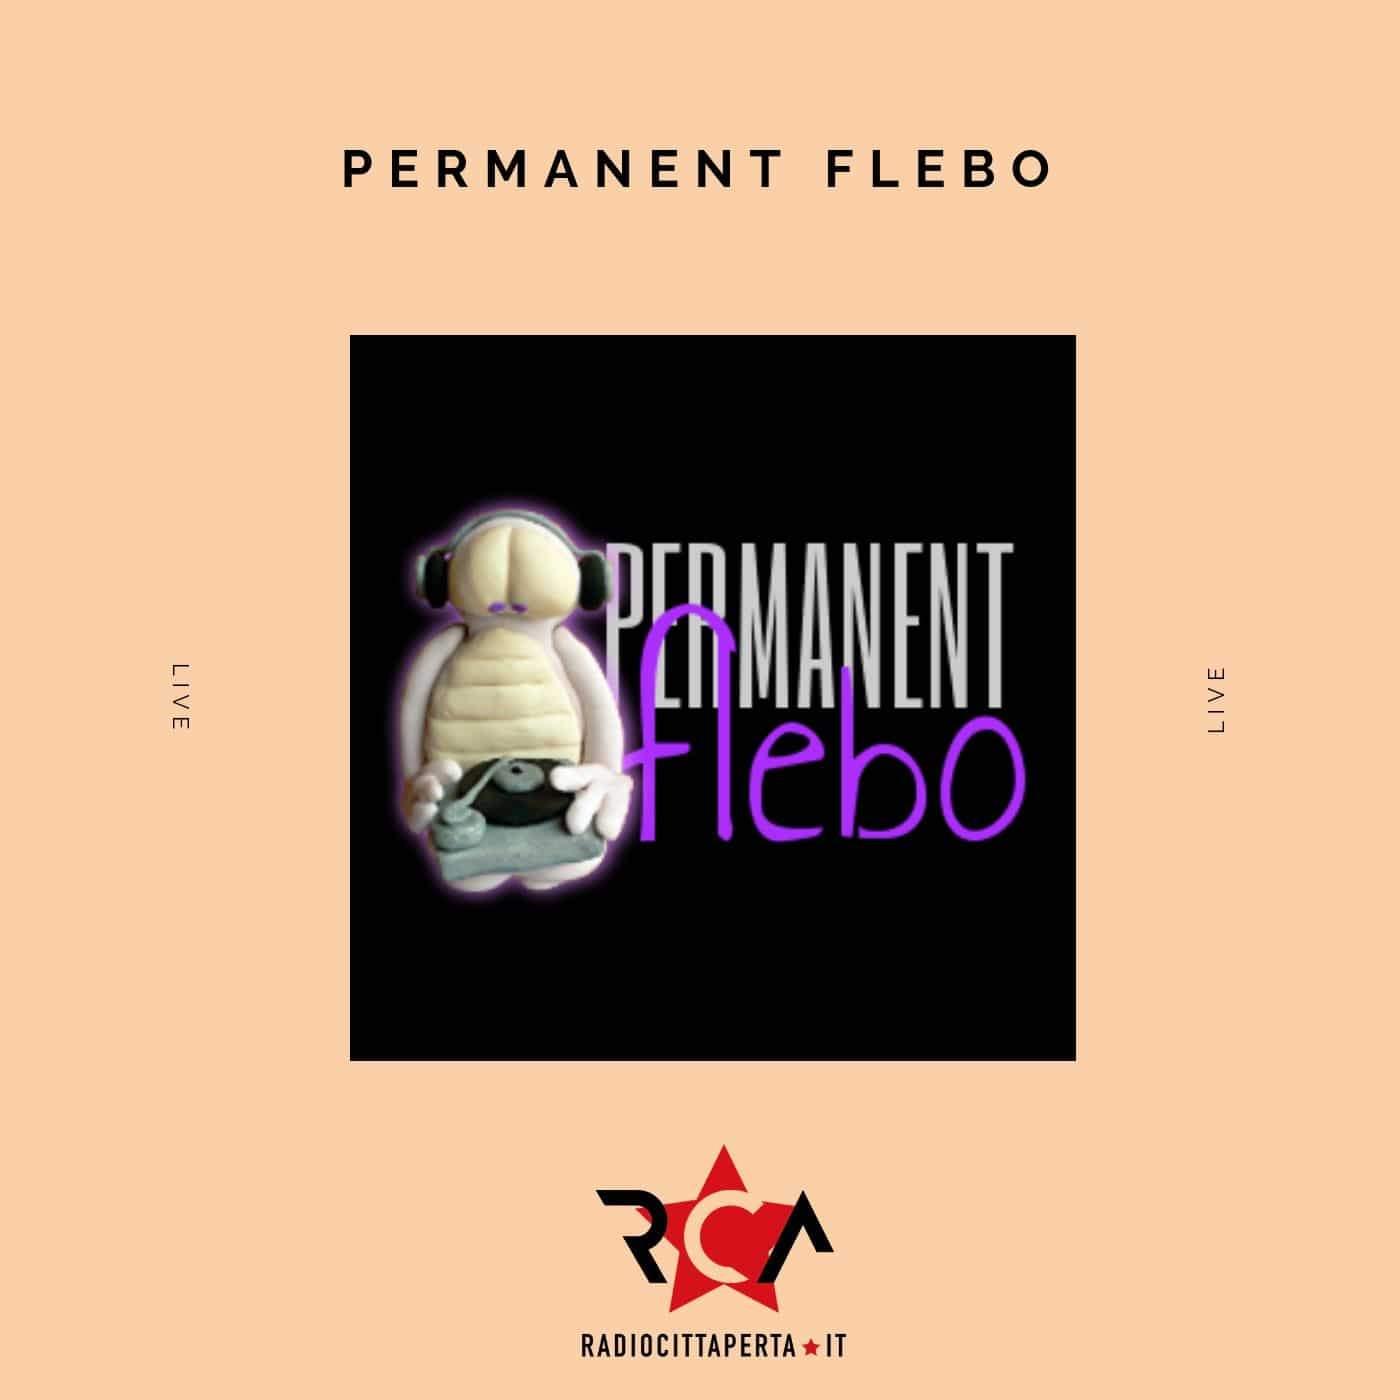 PERMANENT FLEBO